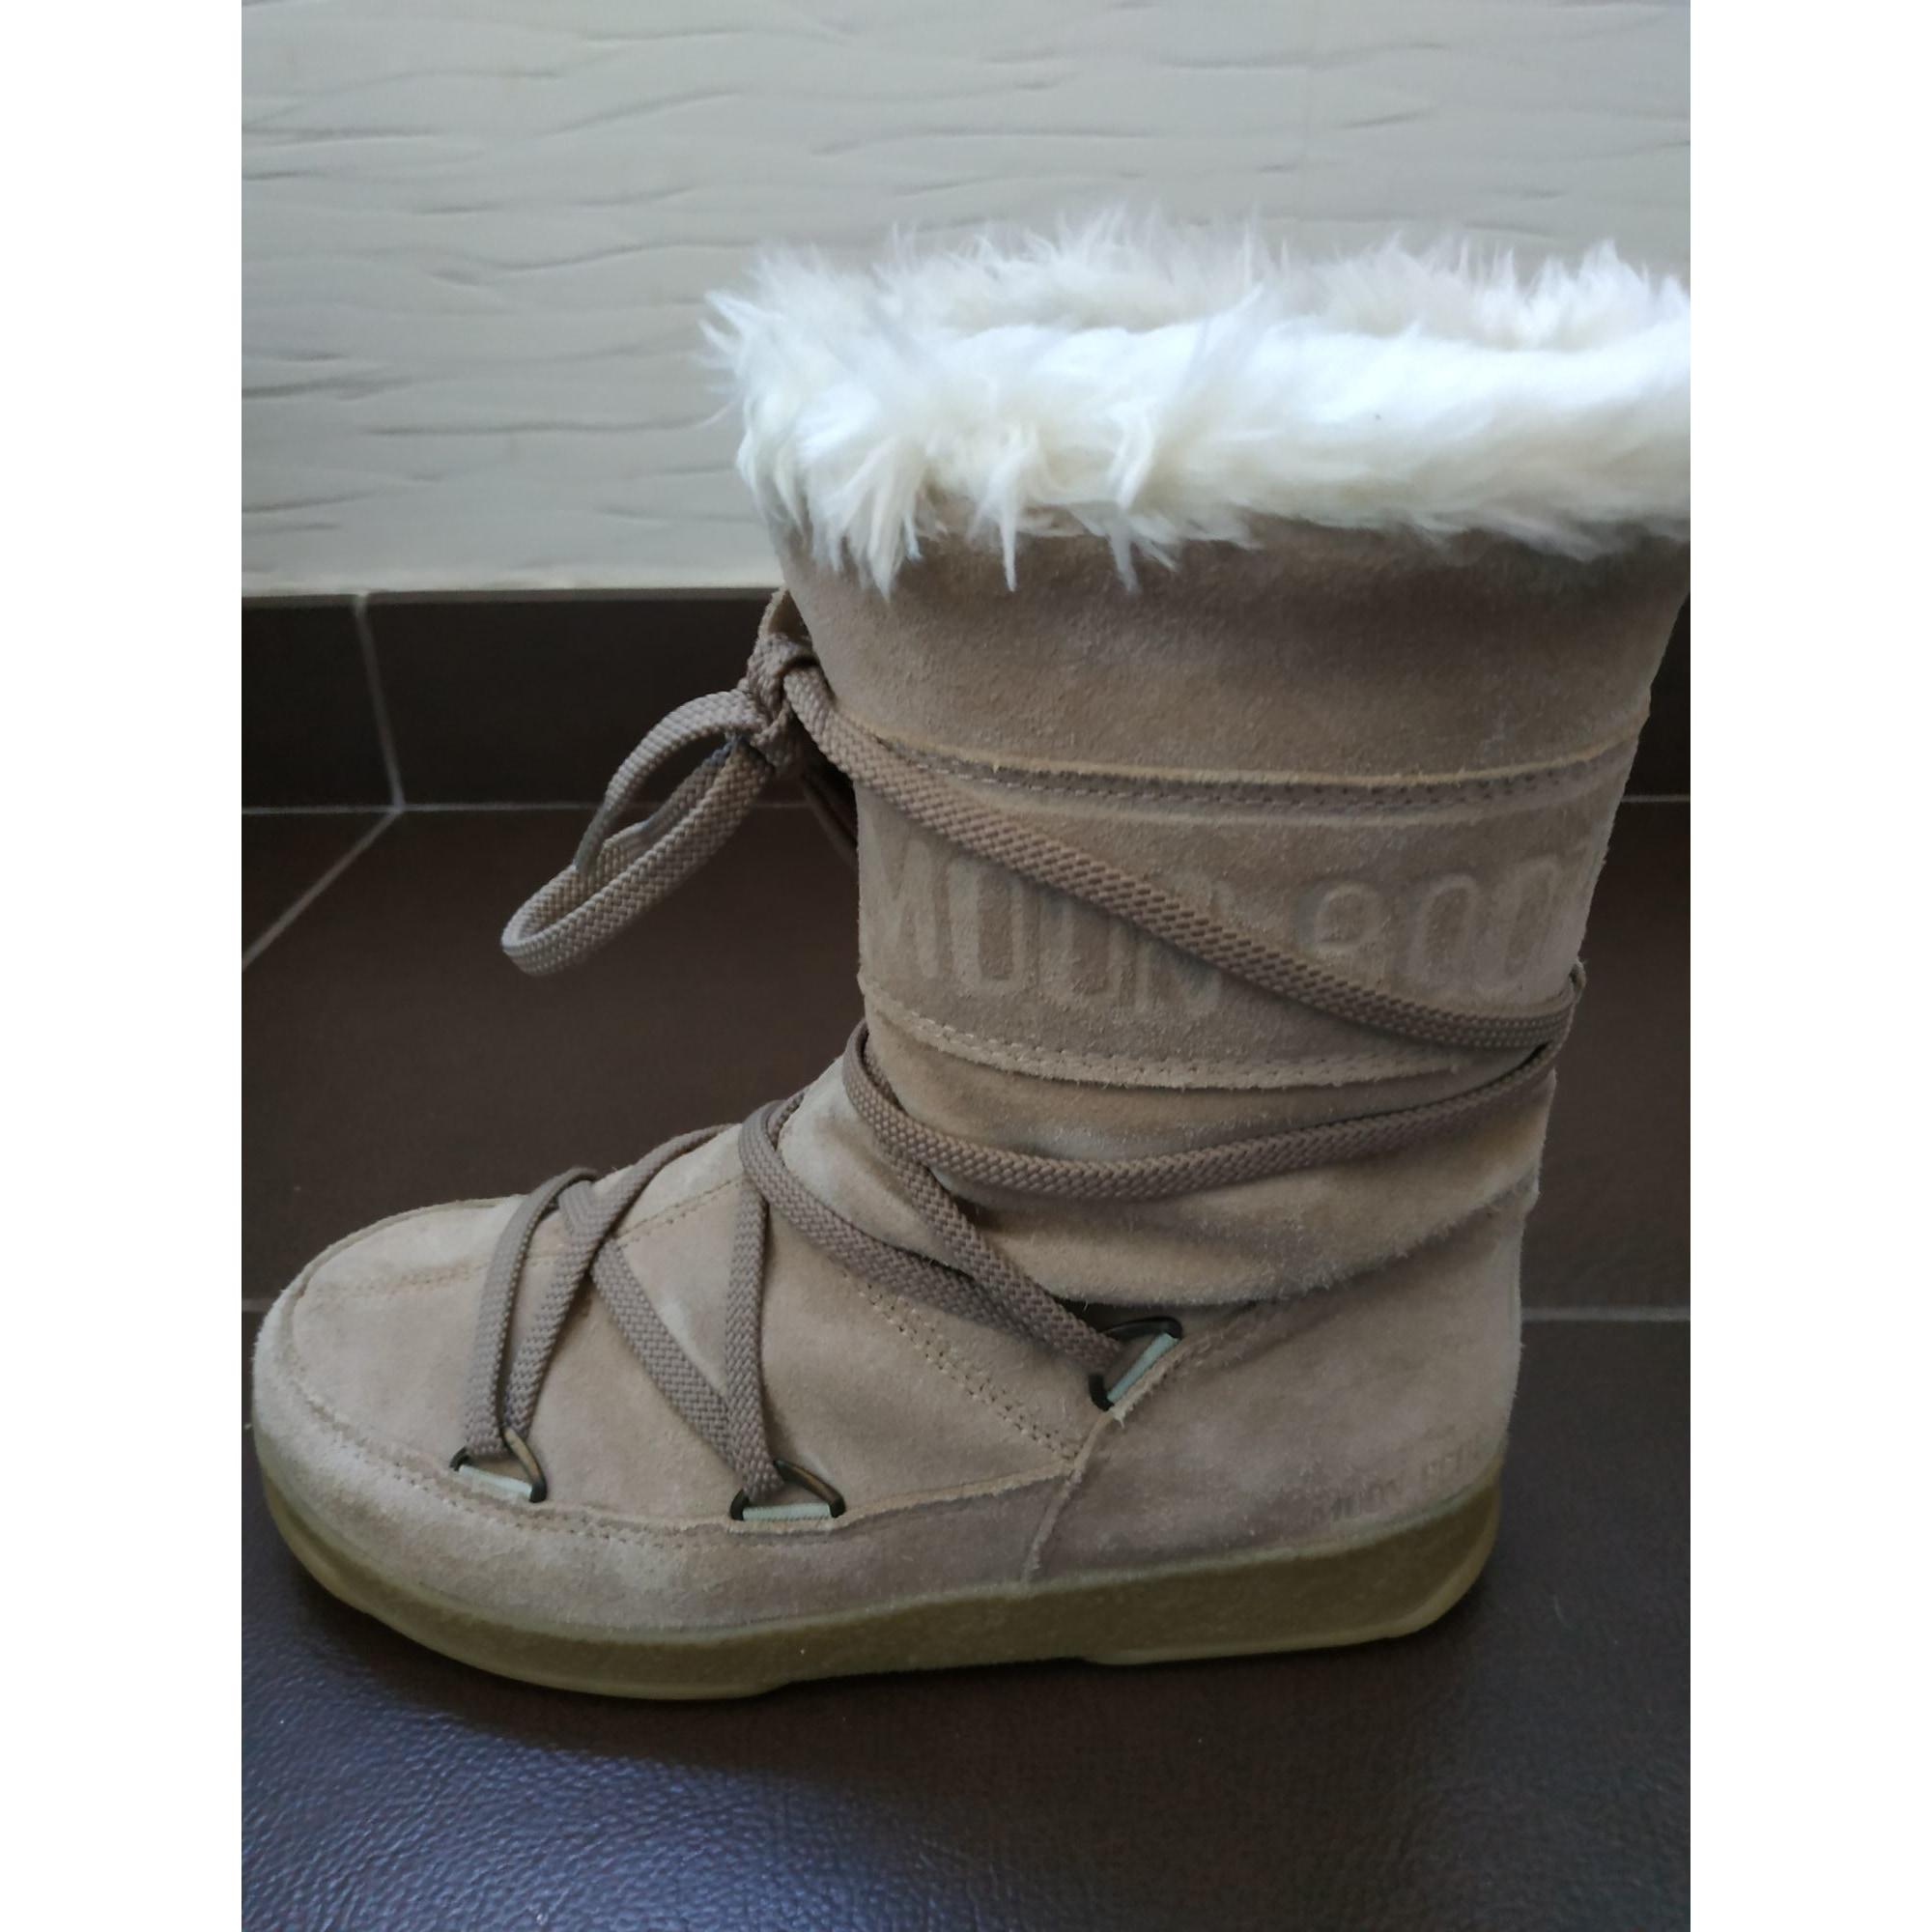 Bottes de neige MOON BOOTS nubuck beige 36